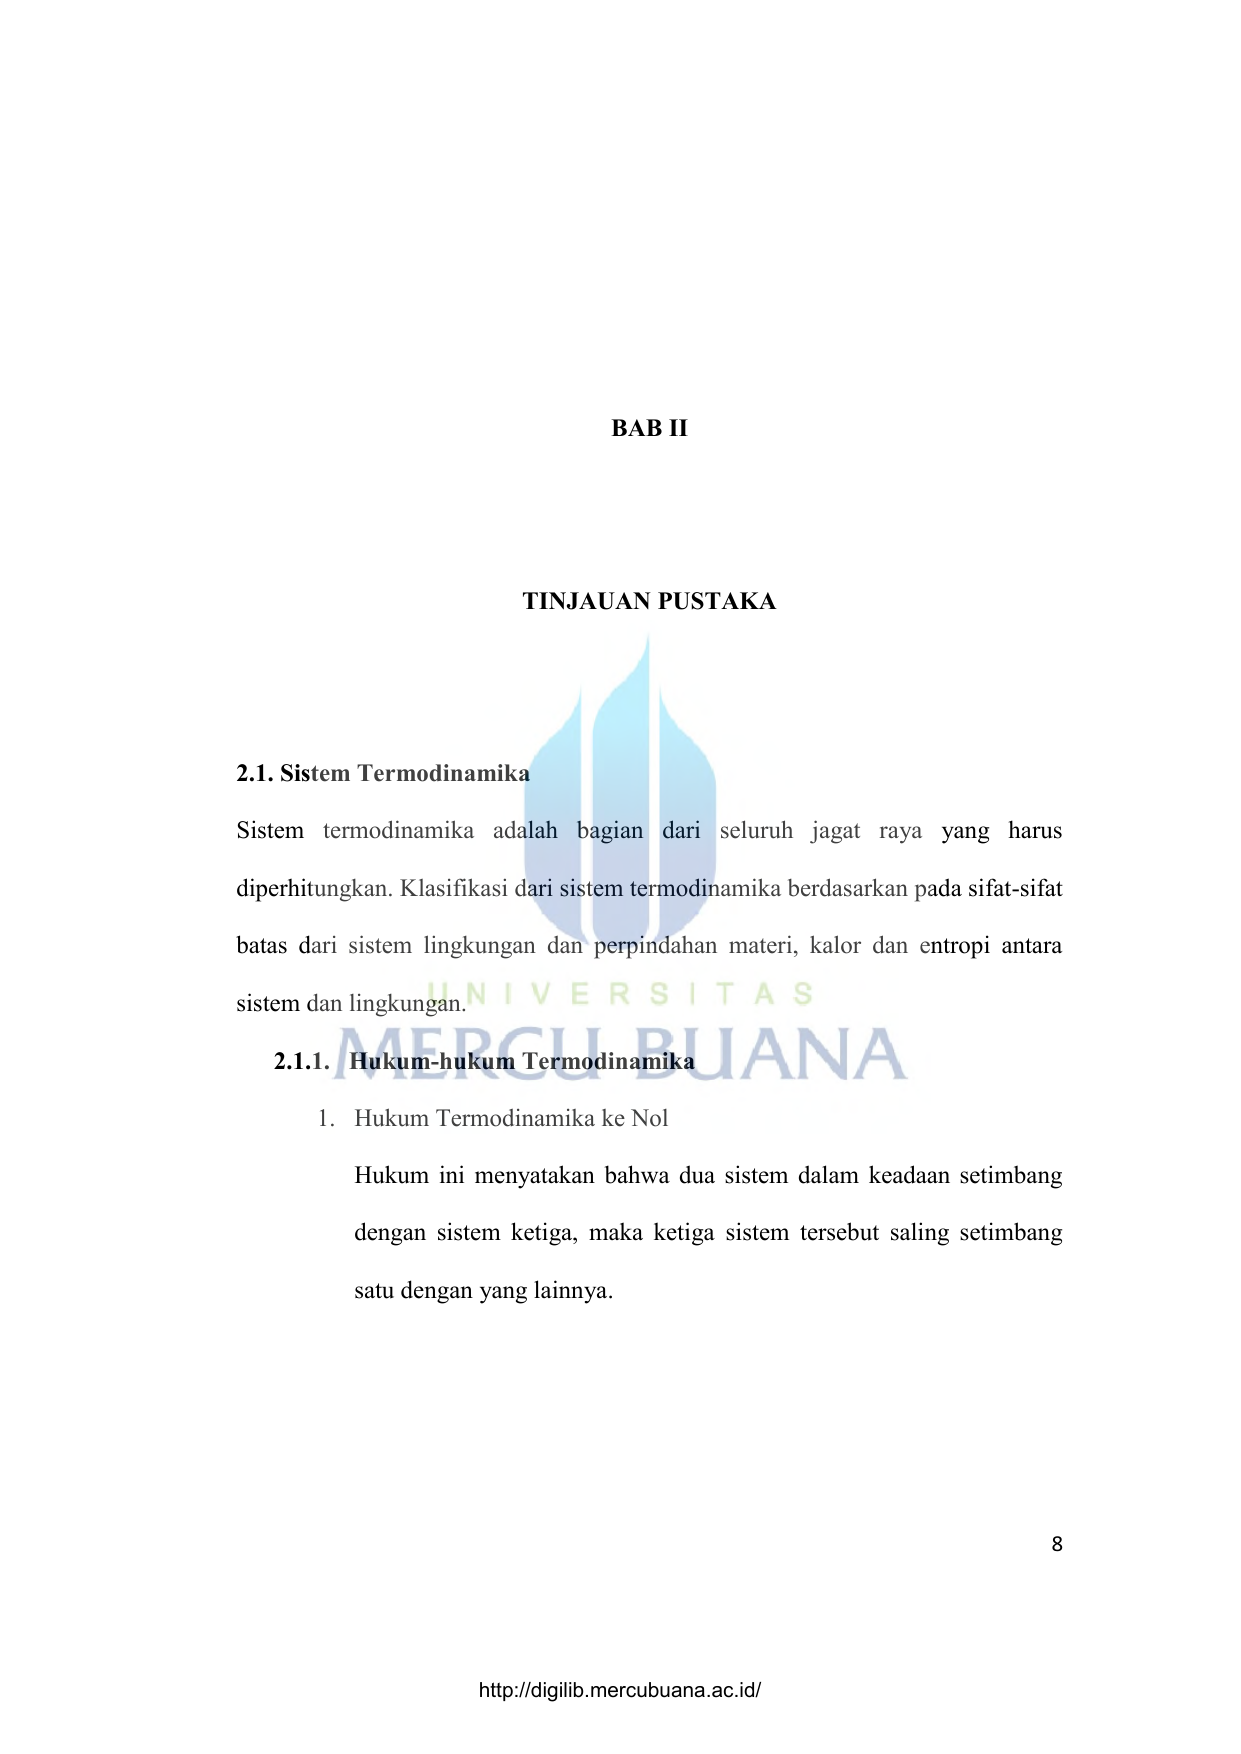 Bab ii tinjauan pustaka 21 sistem termodinamika sistem sistem termodinamika sistem ccuart Gallery